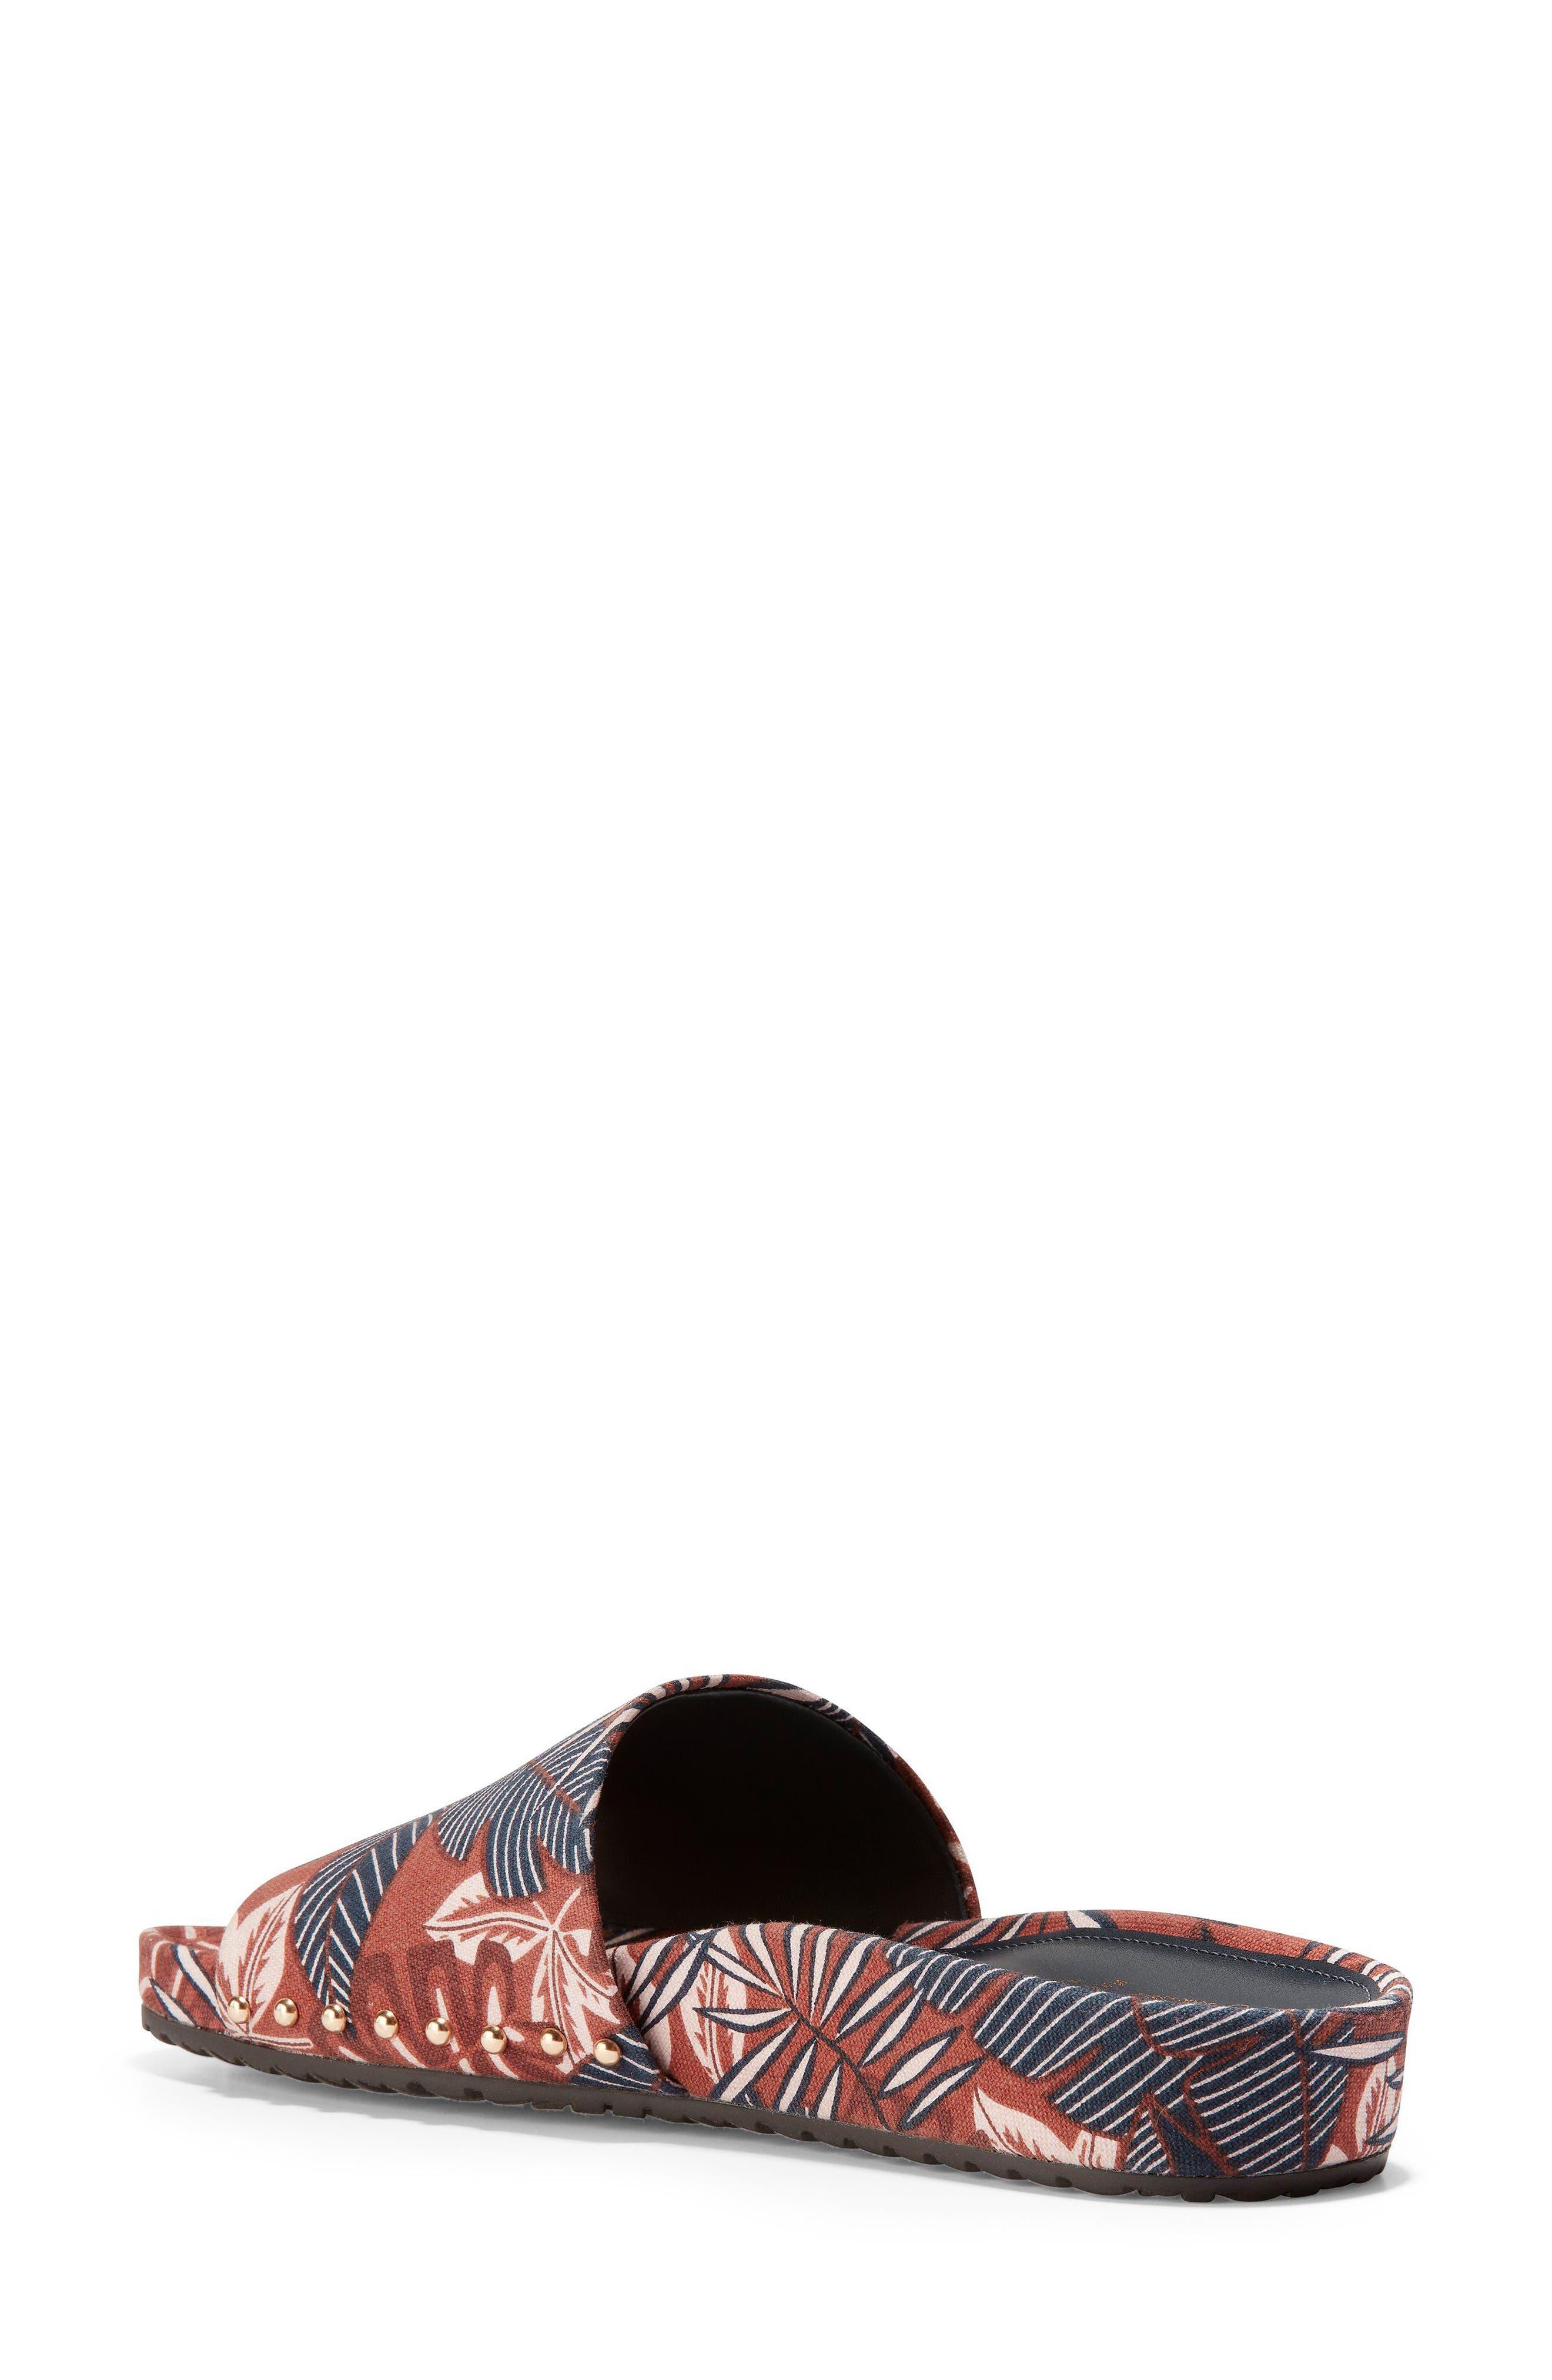 Pinch Montauk Print Slide Sandal,                             Alternate thumbnail 2, color,                             Tropical Palm Print Fabric